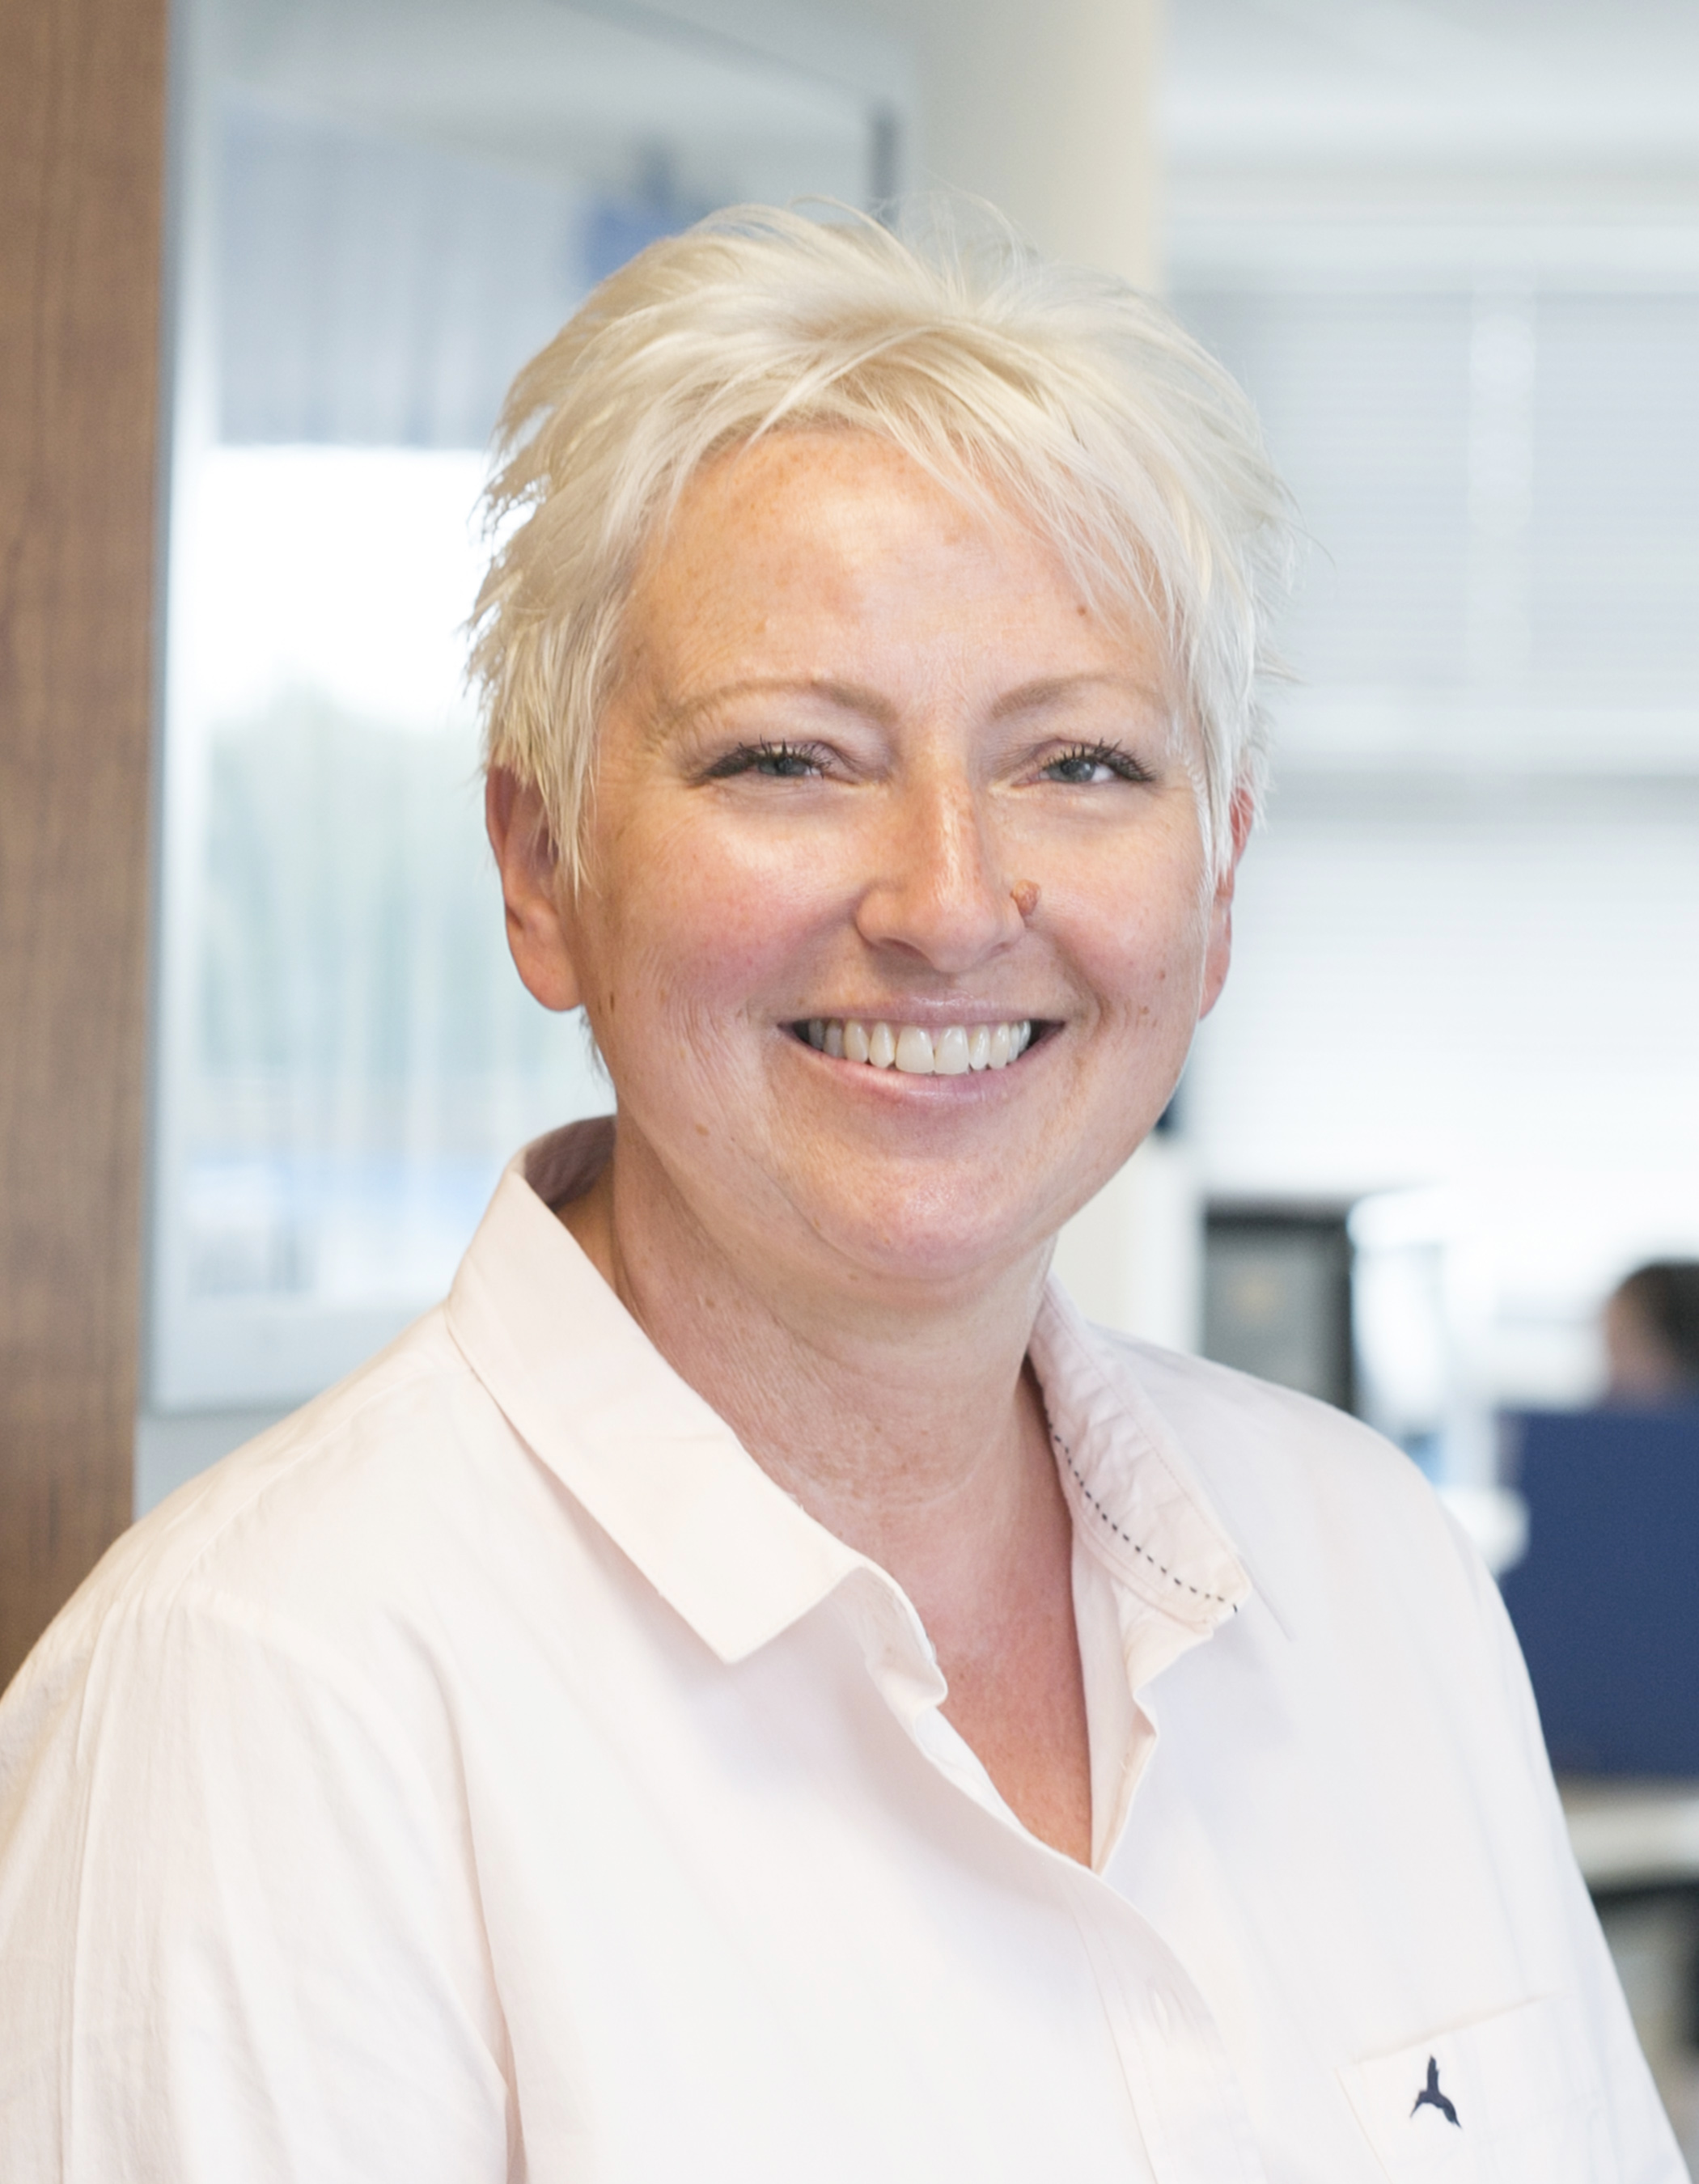 oakstone international executive search saas claire sherwood